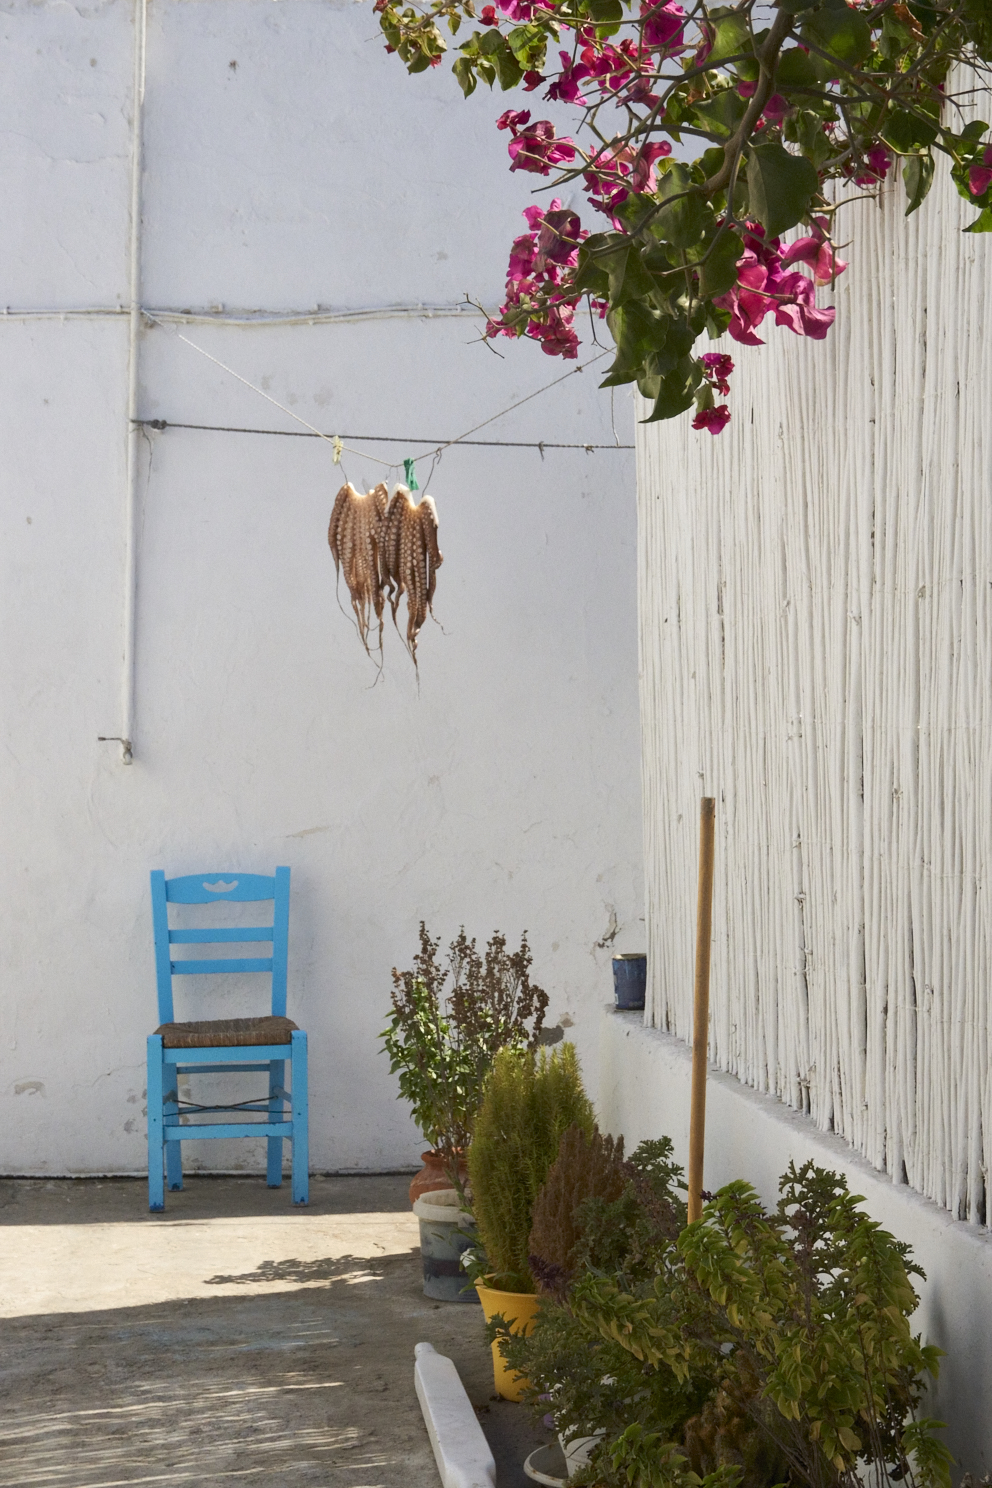 GREECE_MILOS_0048.jpg